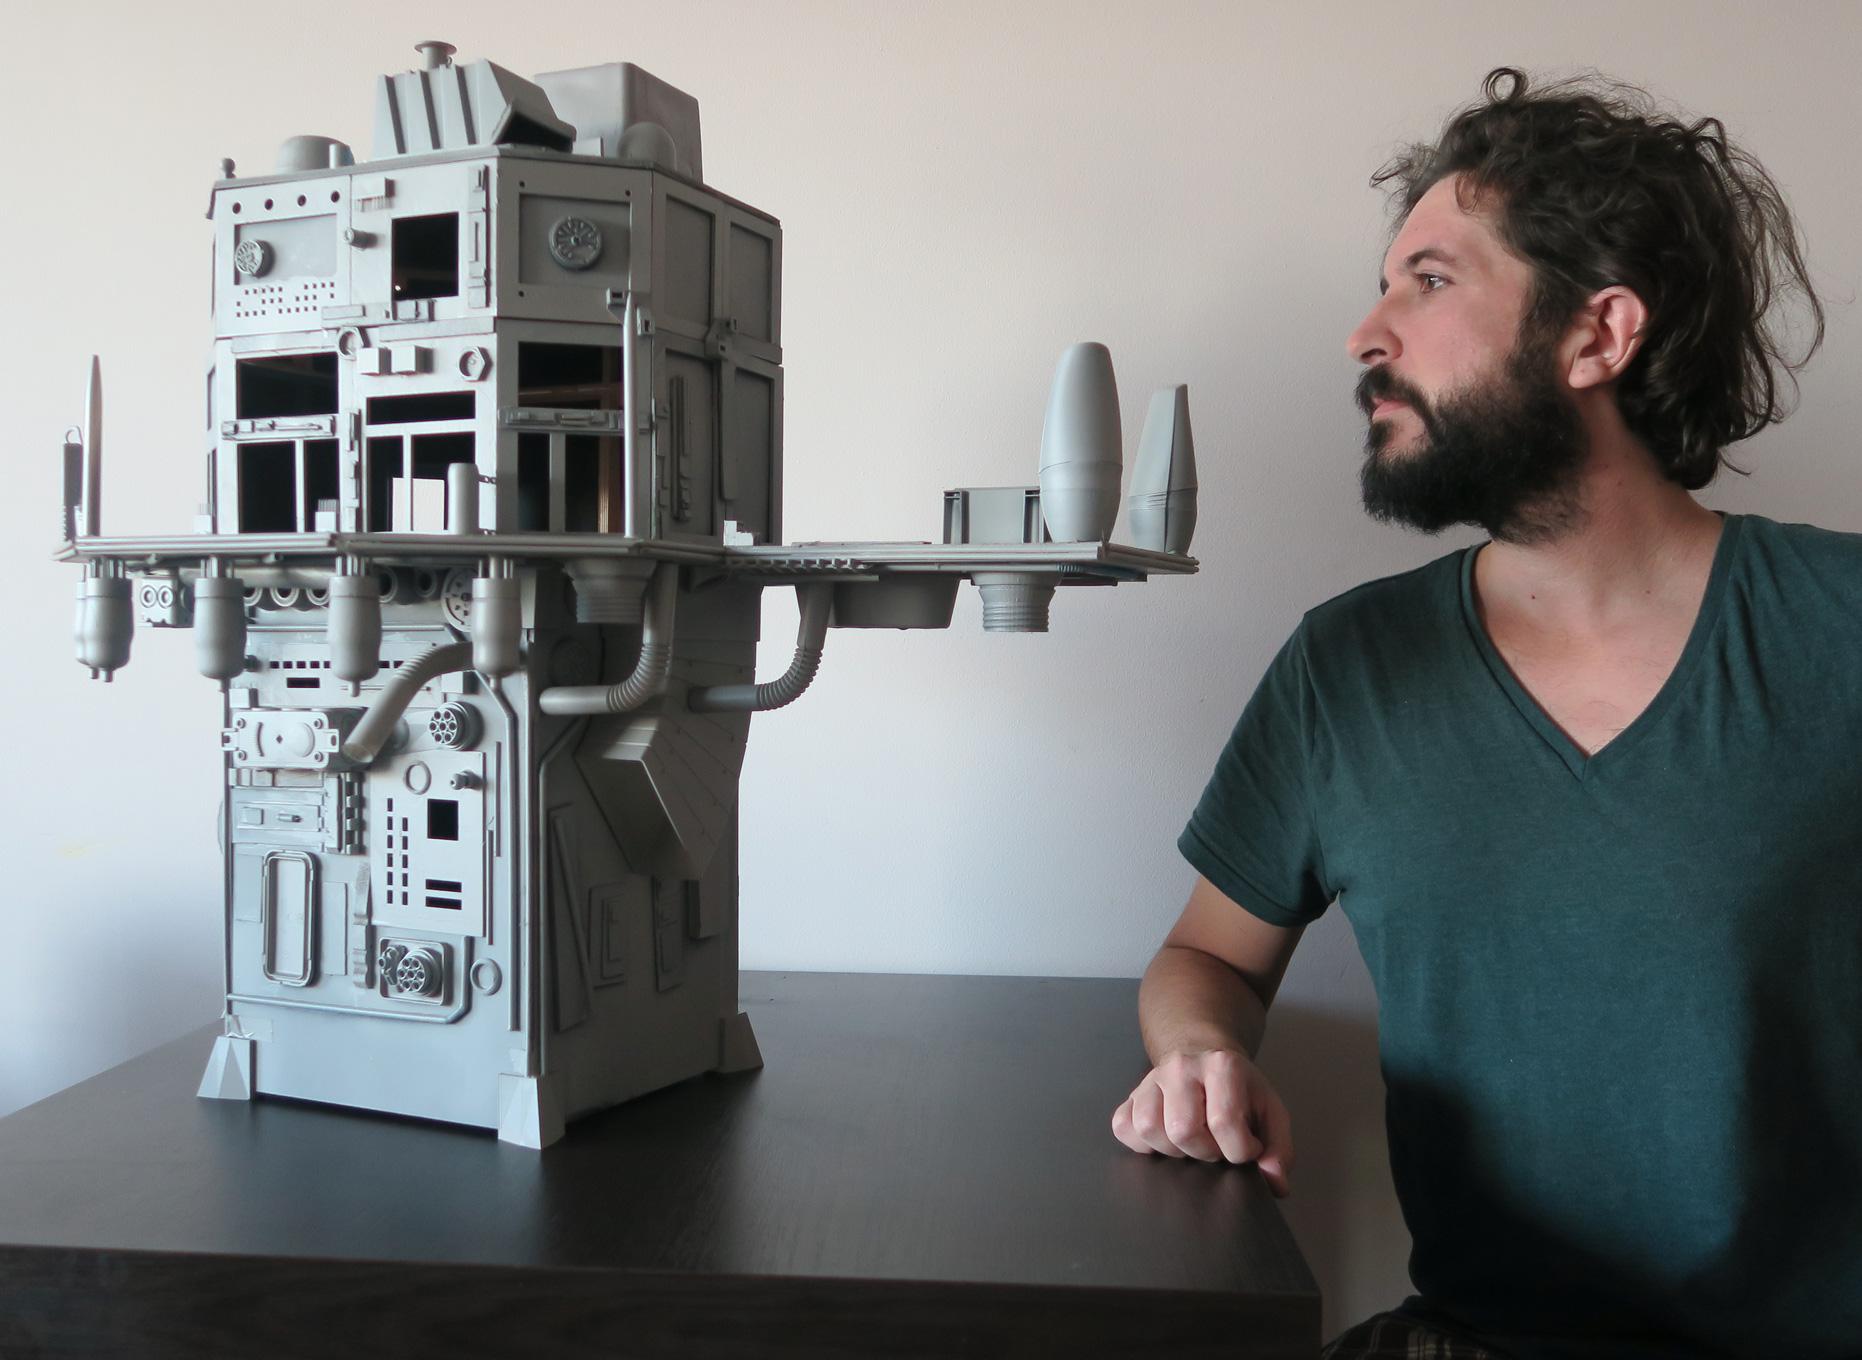 Nicola poses with his 3D printed city structure. Photo via Nicola Piosevan.